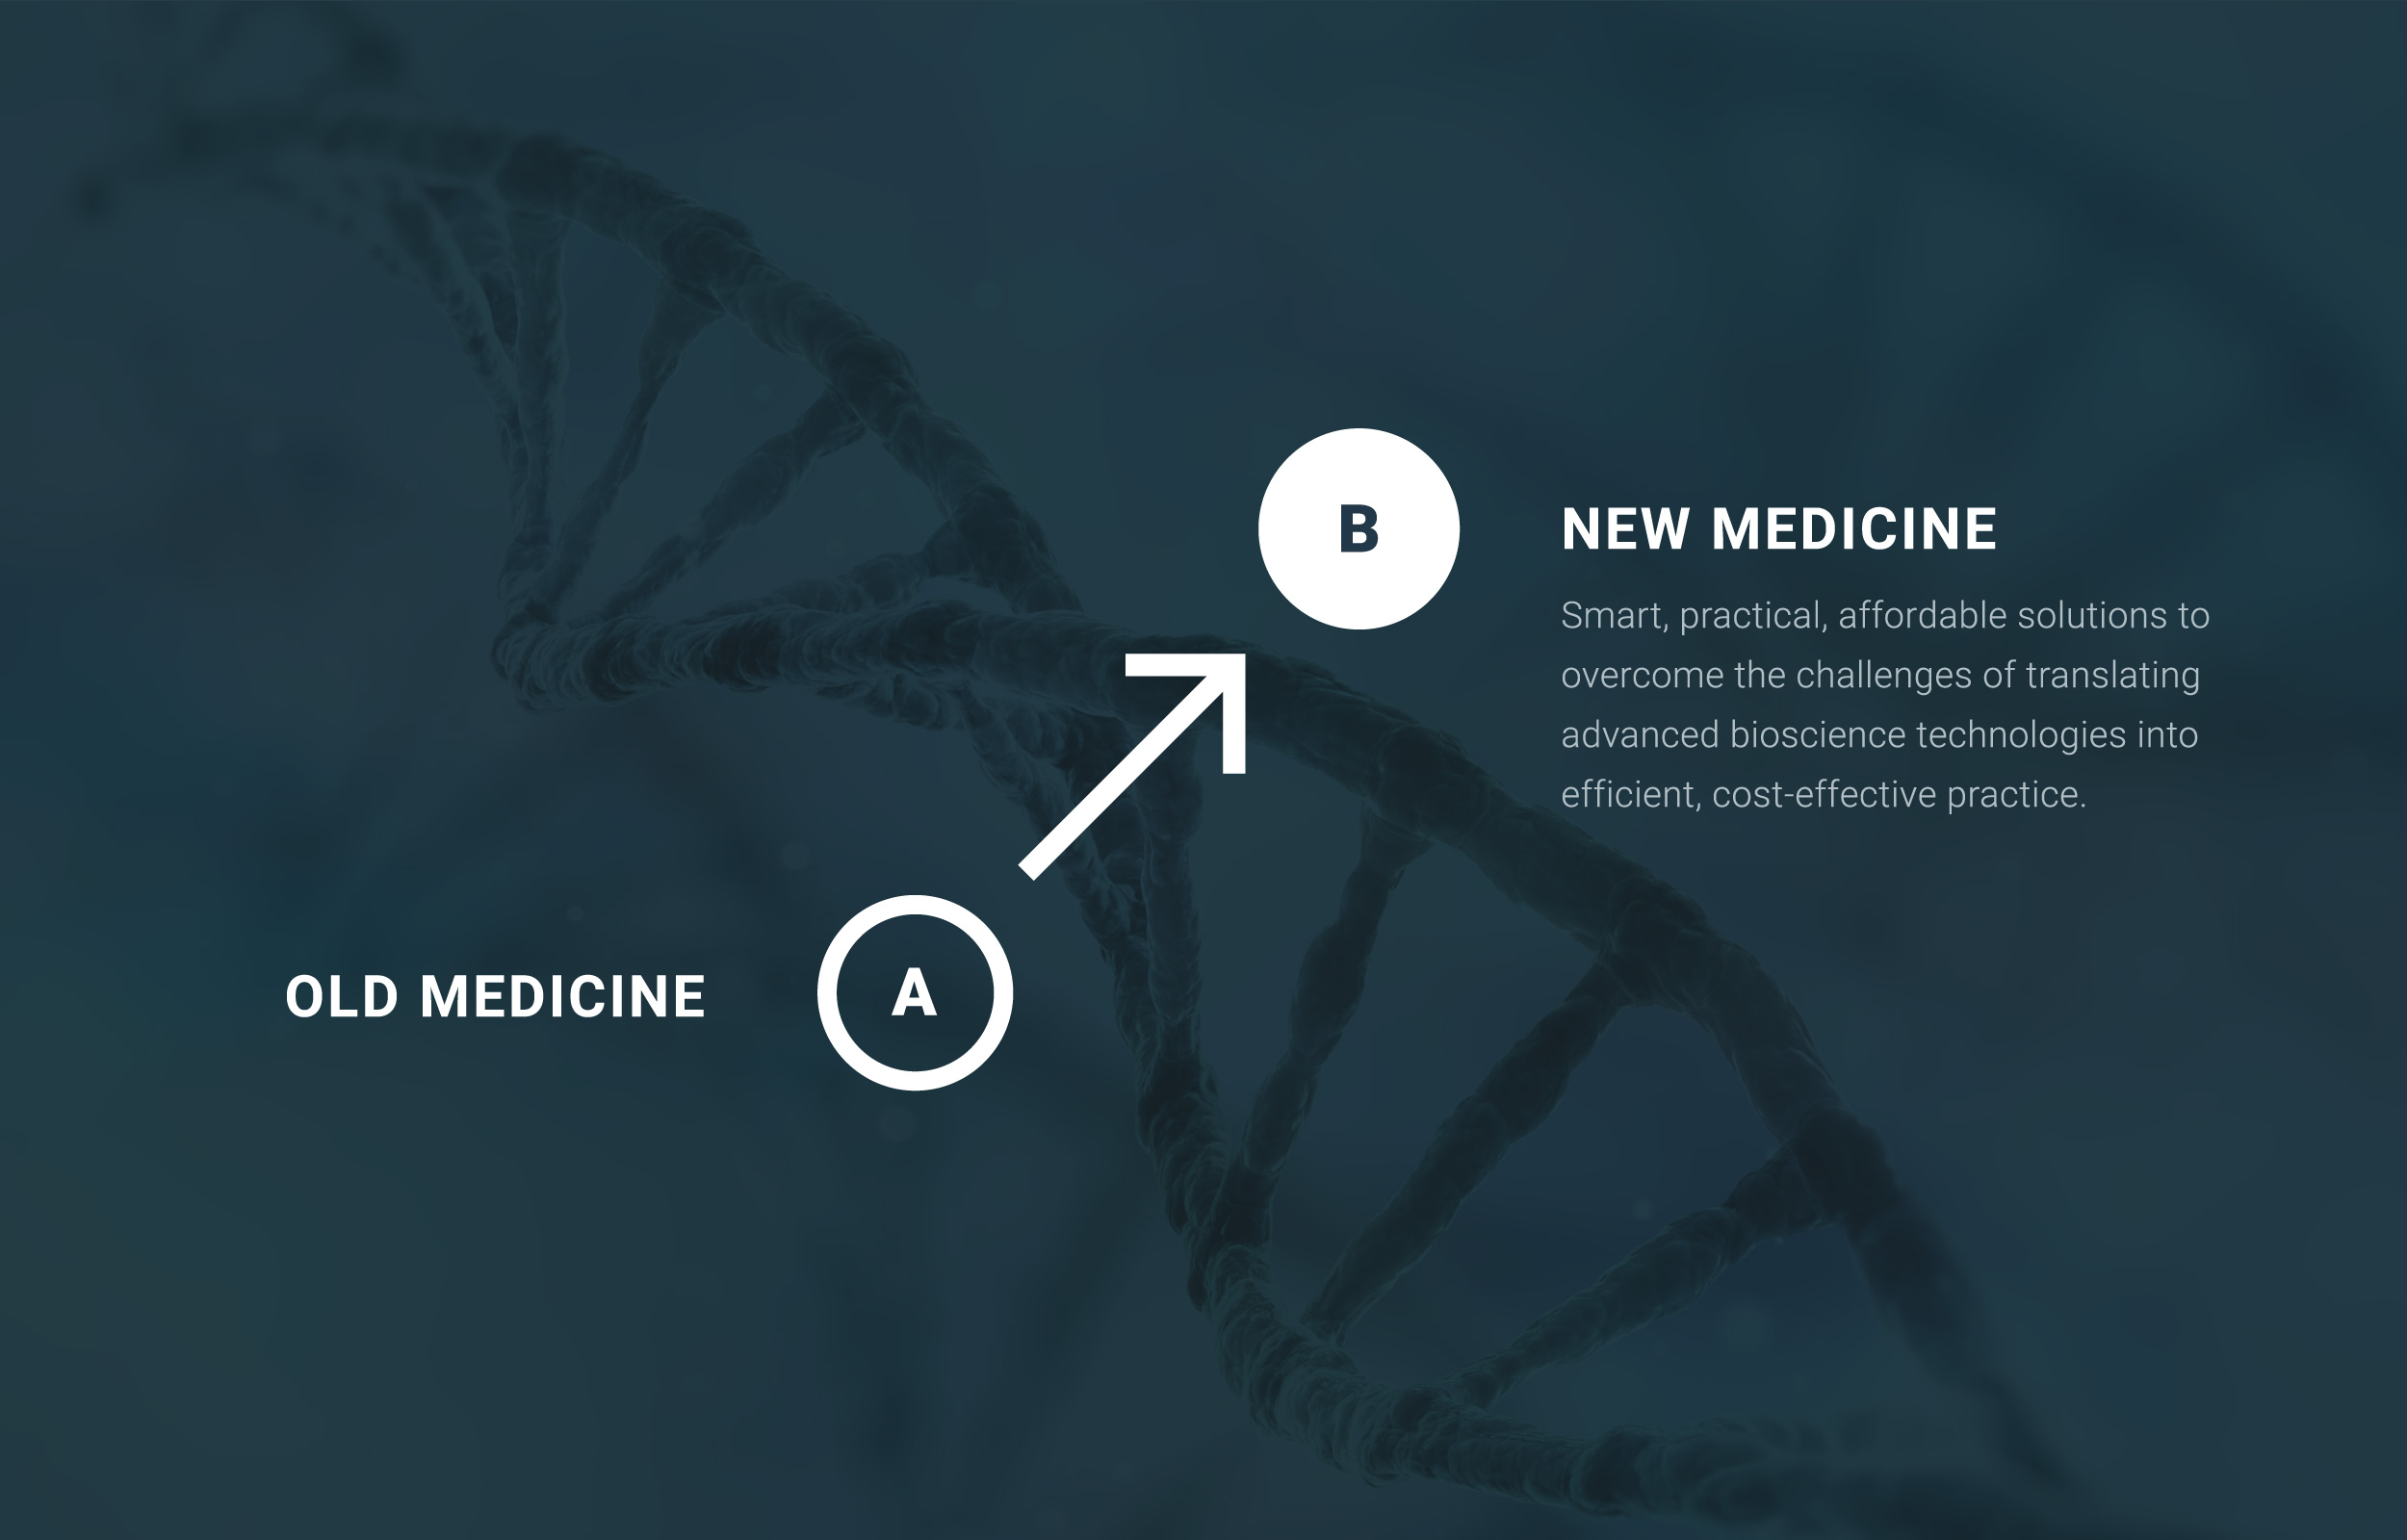 New-Medicine-Identity-by-Ian-Whalley.jpg